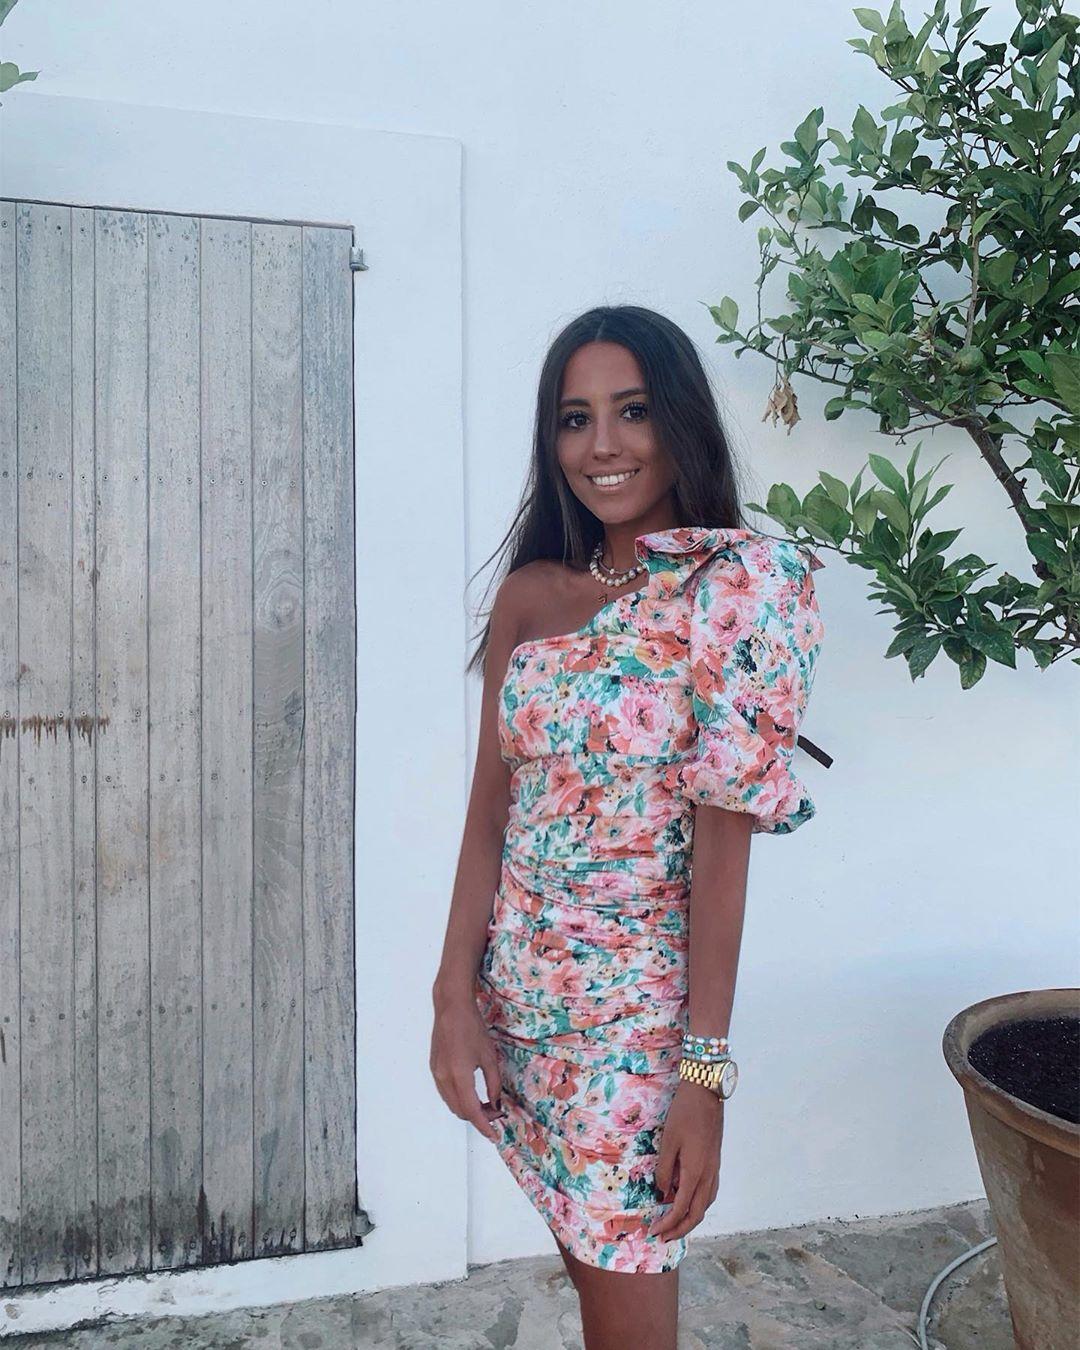 floral print asymmetrical dress de Zara sur gpalazuelos